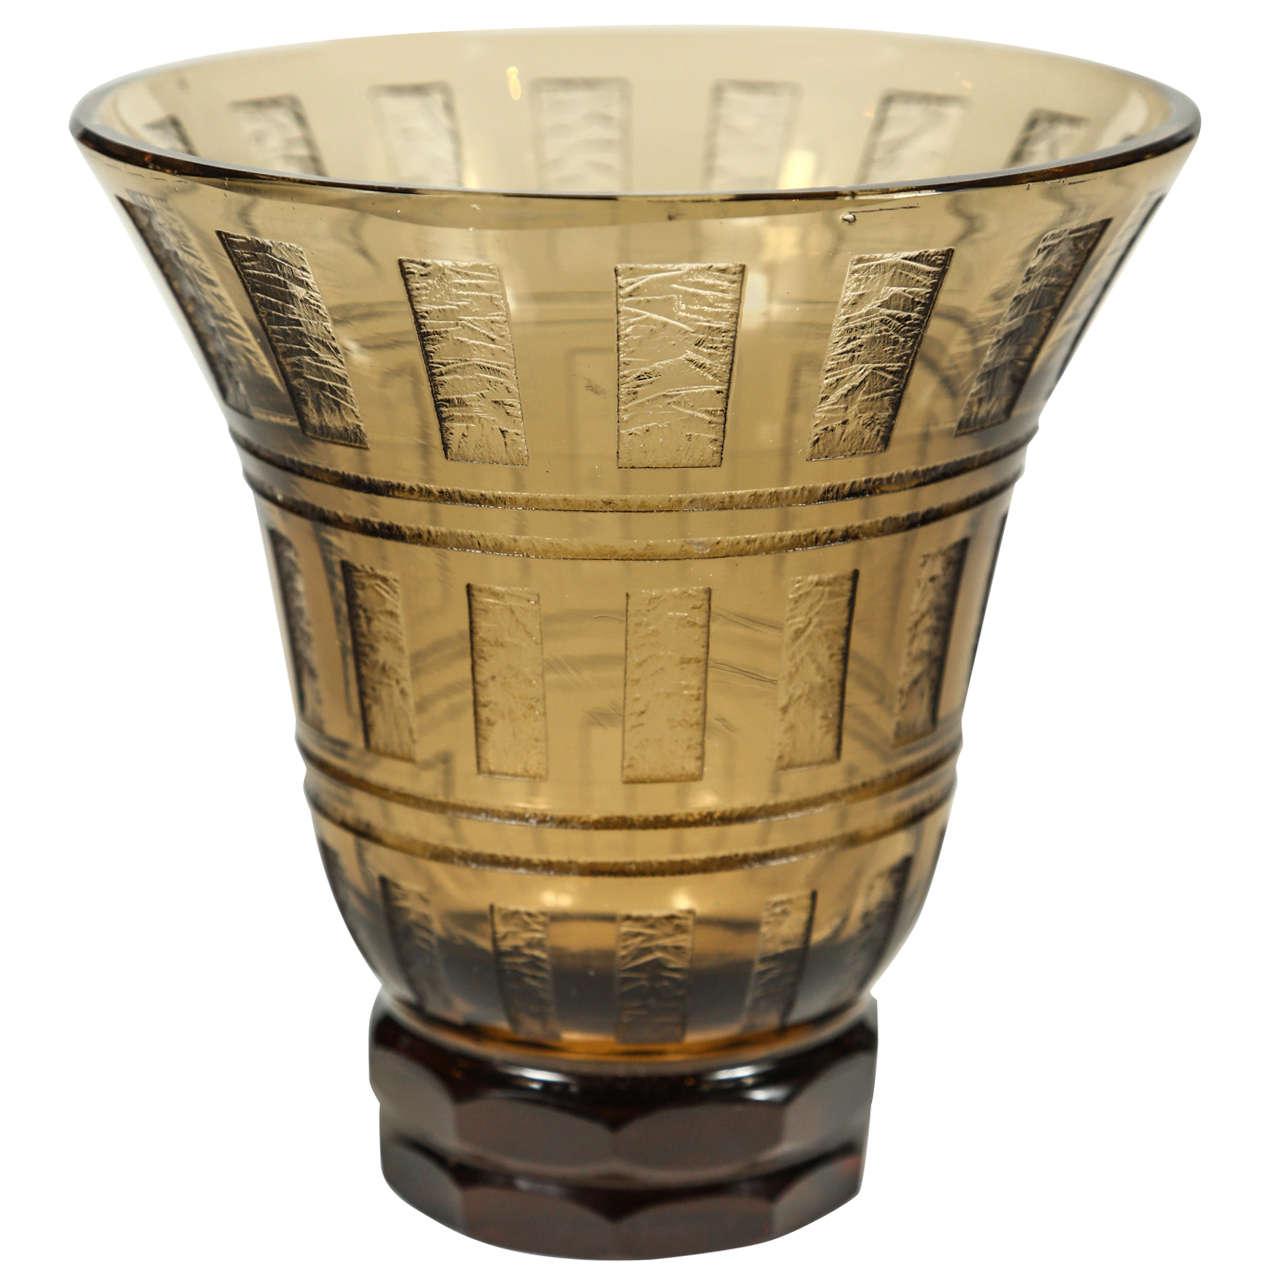 Petite Acid Etched Vase by Daum